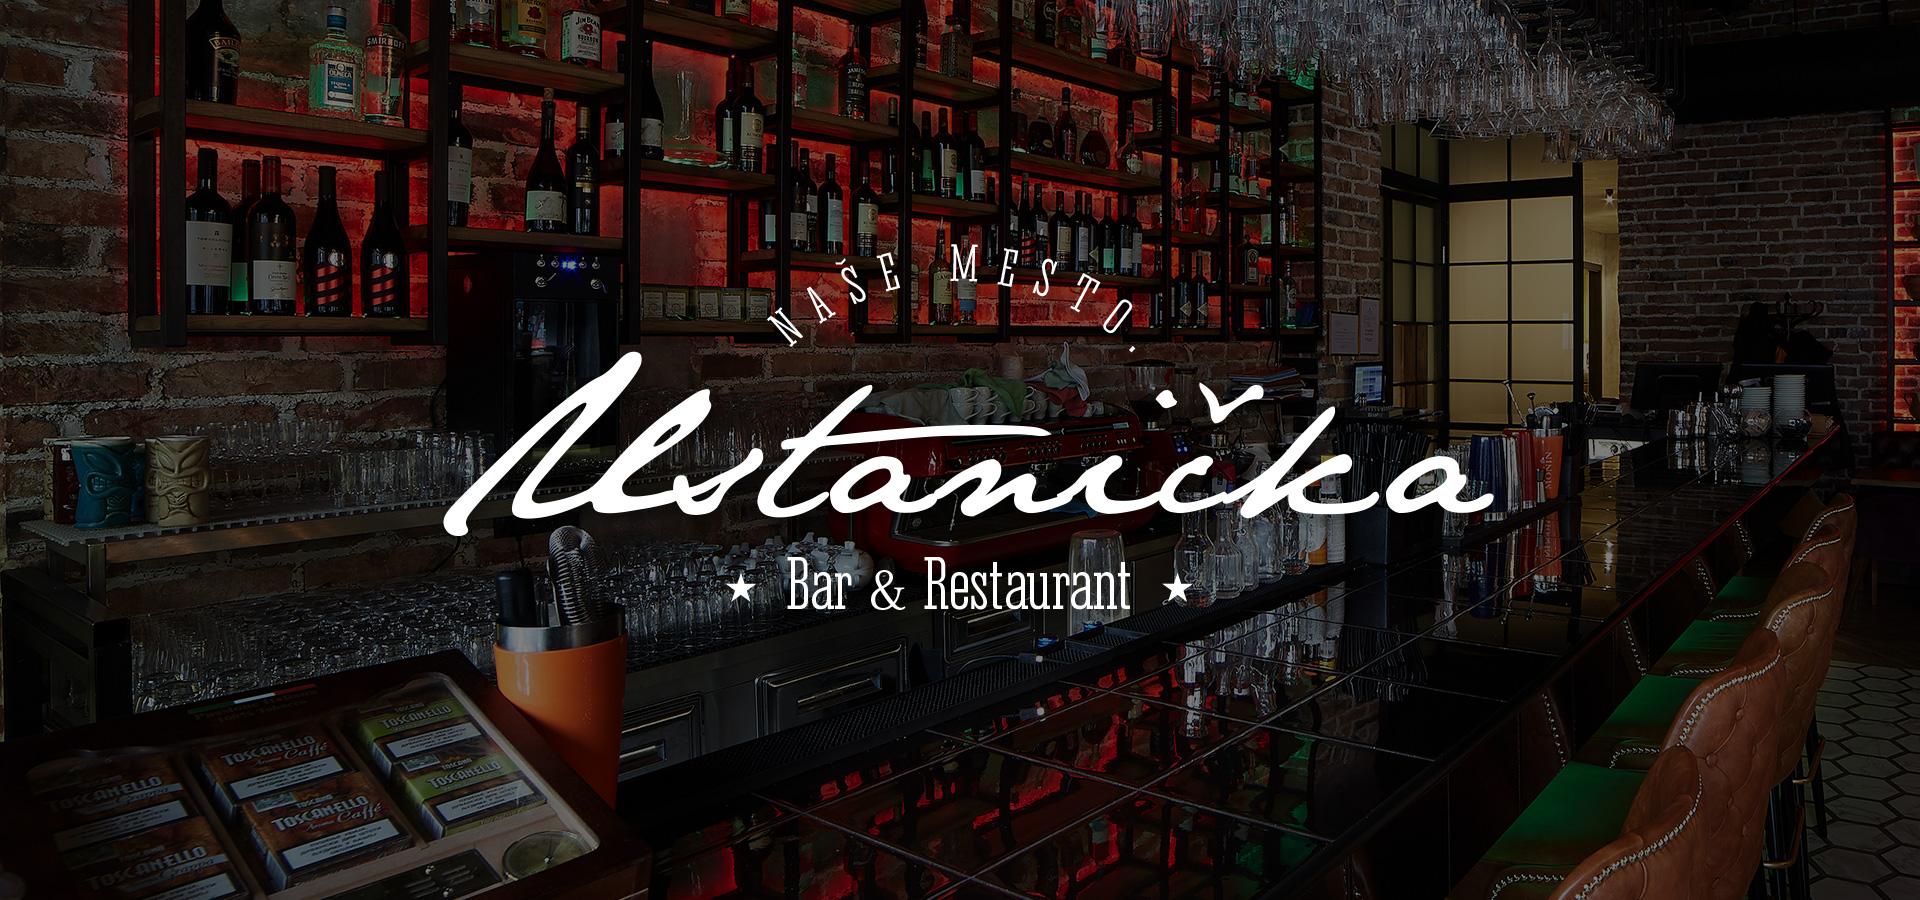 ustanicka beograd mapa Restoran & Bar Ustanička   Naše mesto | Ustanička 66   011 2445000 ustanicka beograd mapa